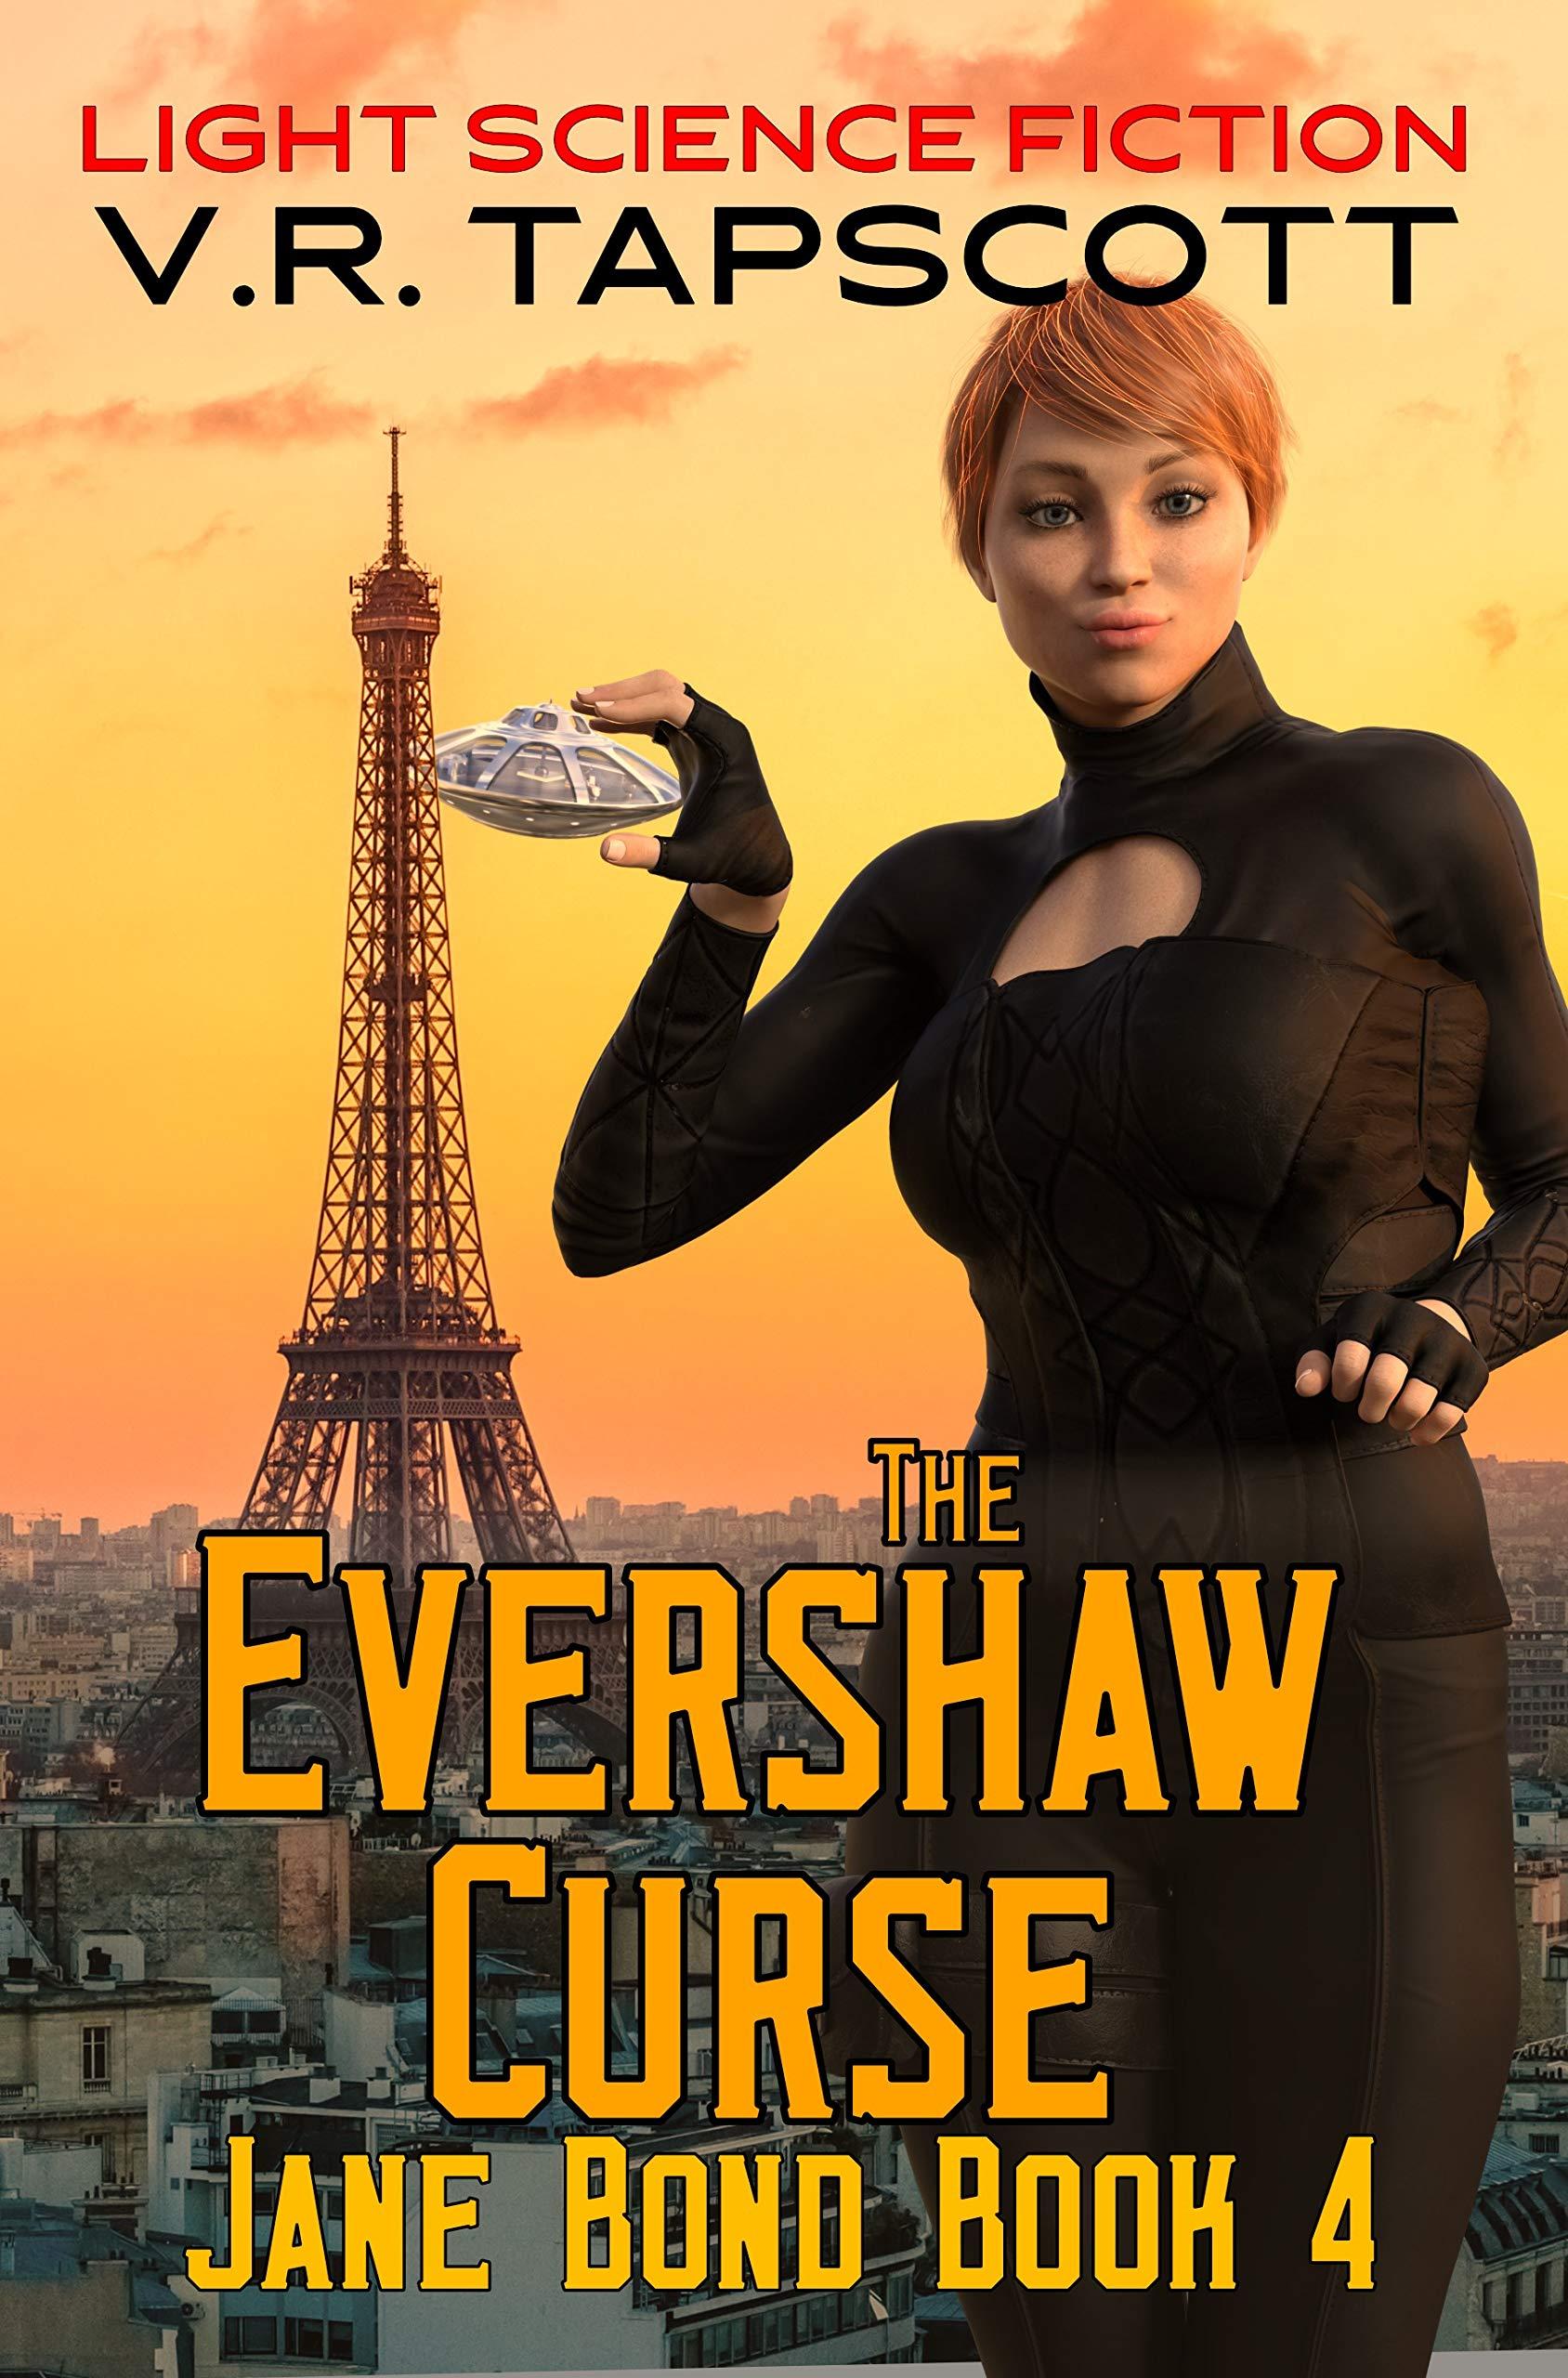 Jane Bond - The Evershaw Curse: Light Science Fiction